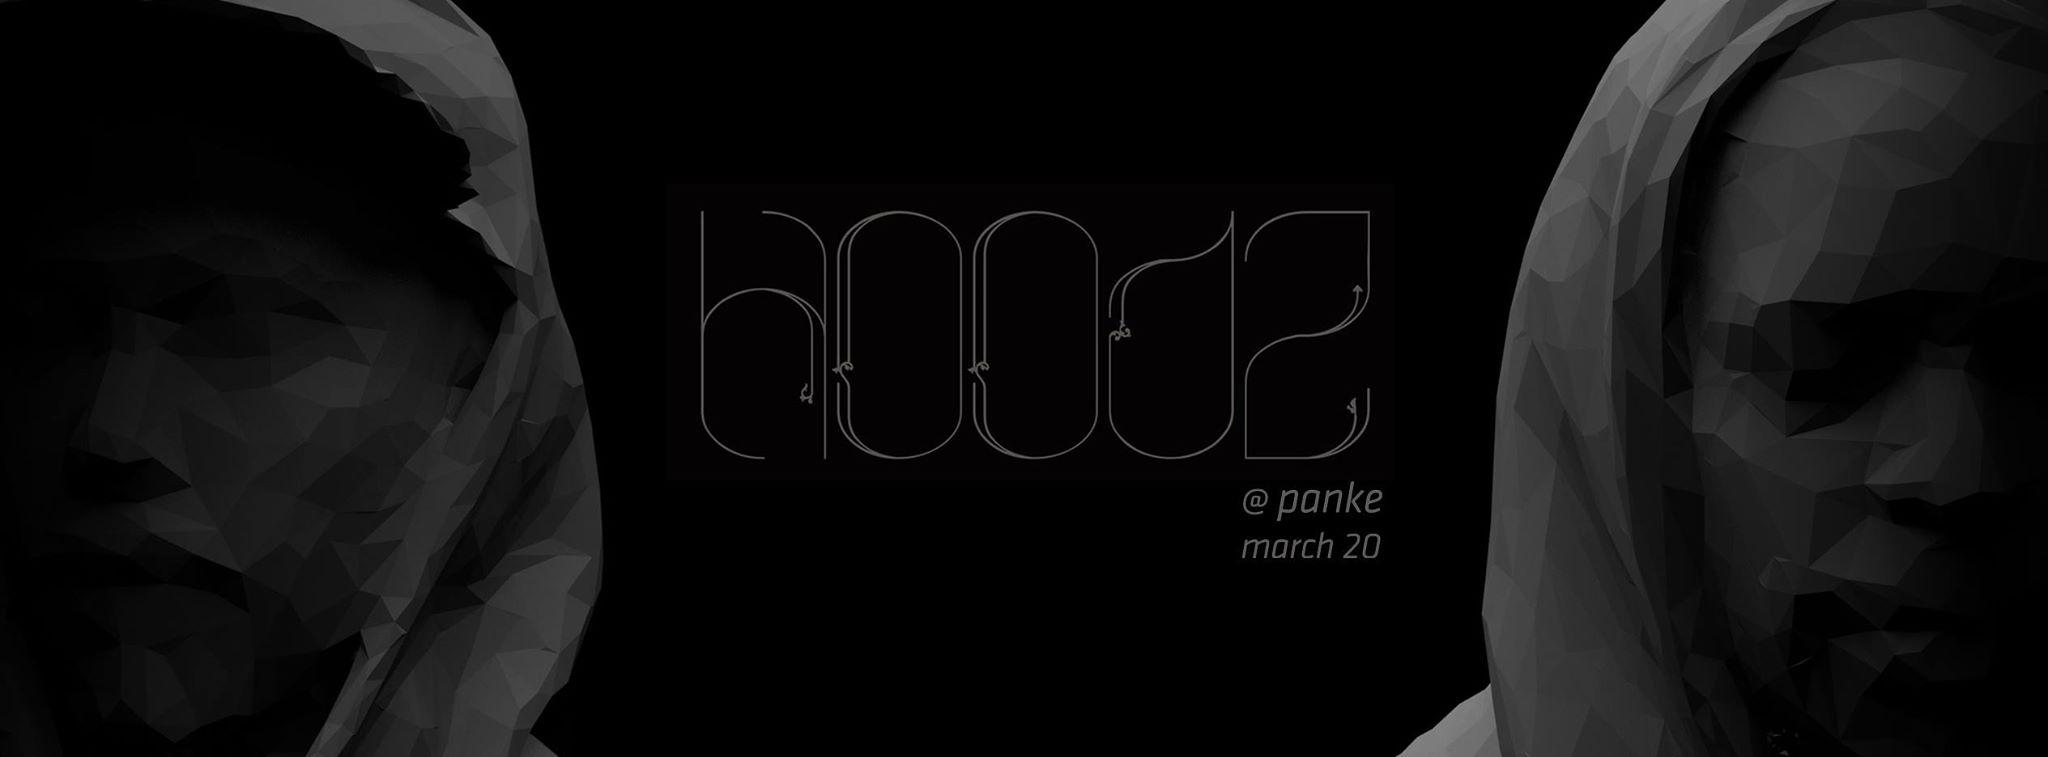 Hoodz @ Panke